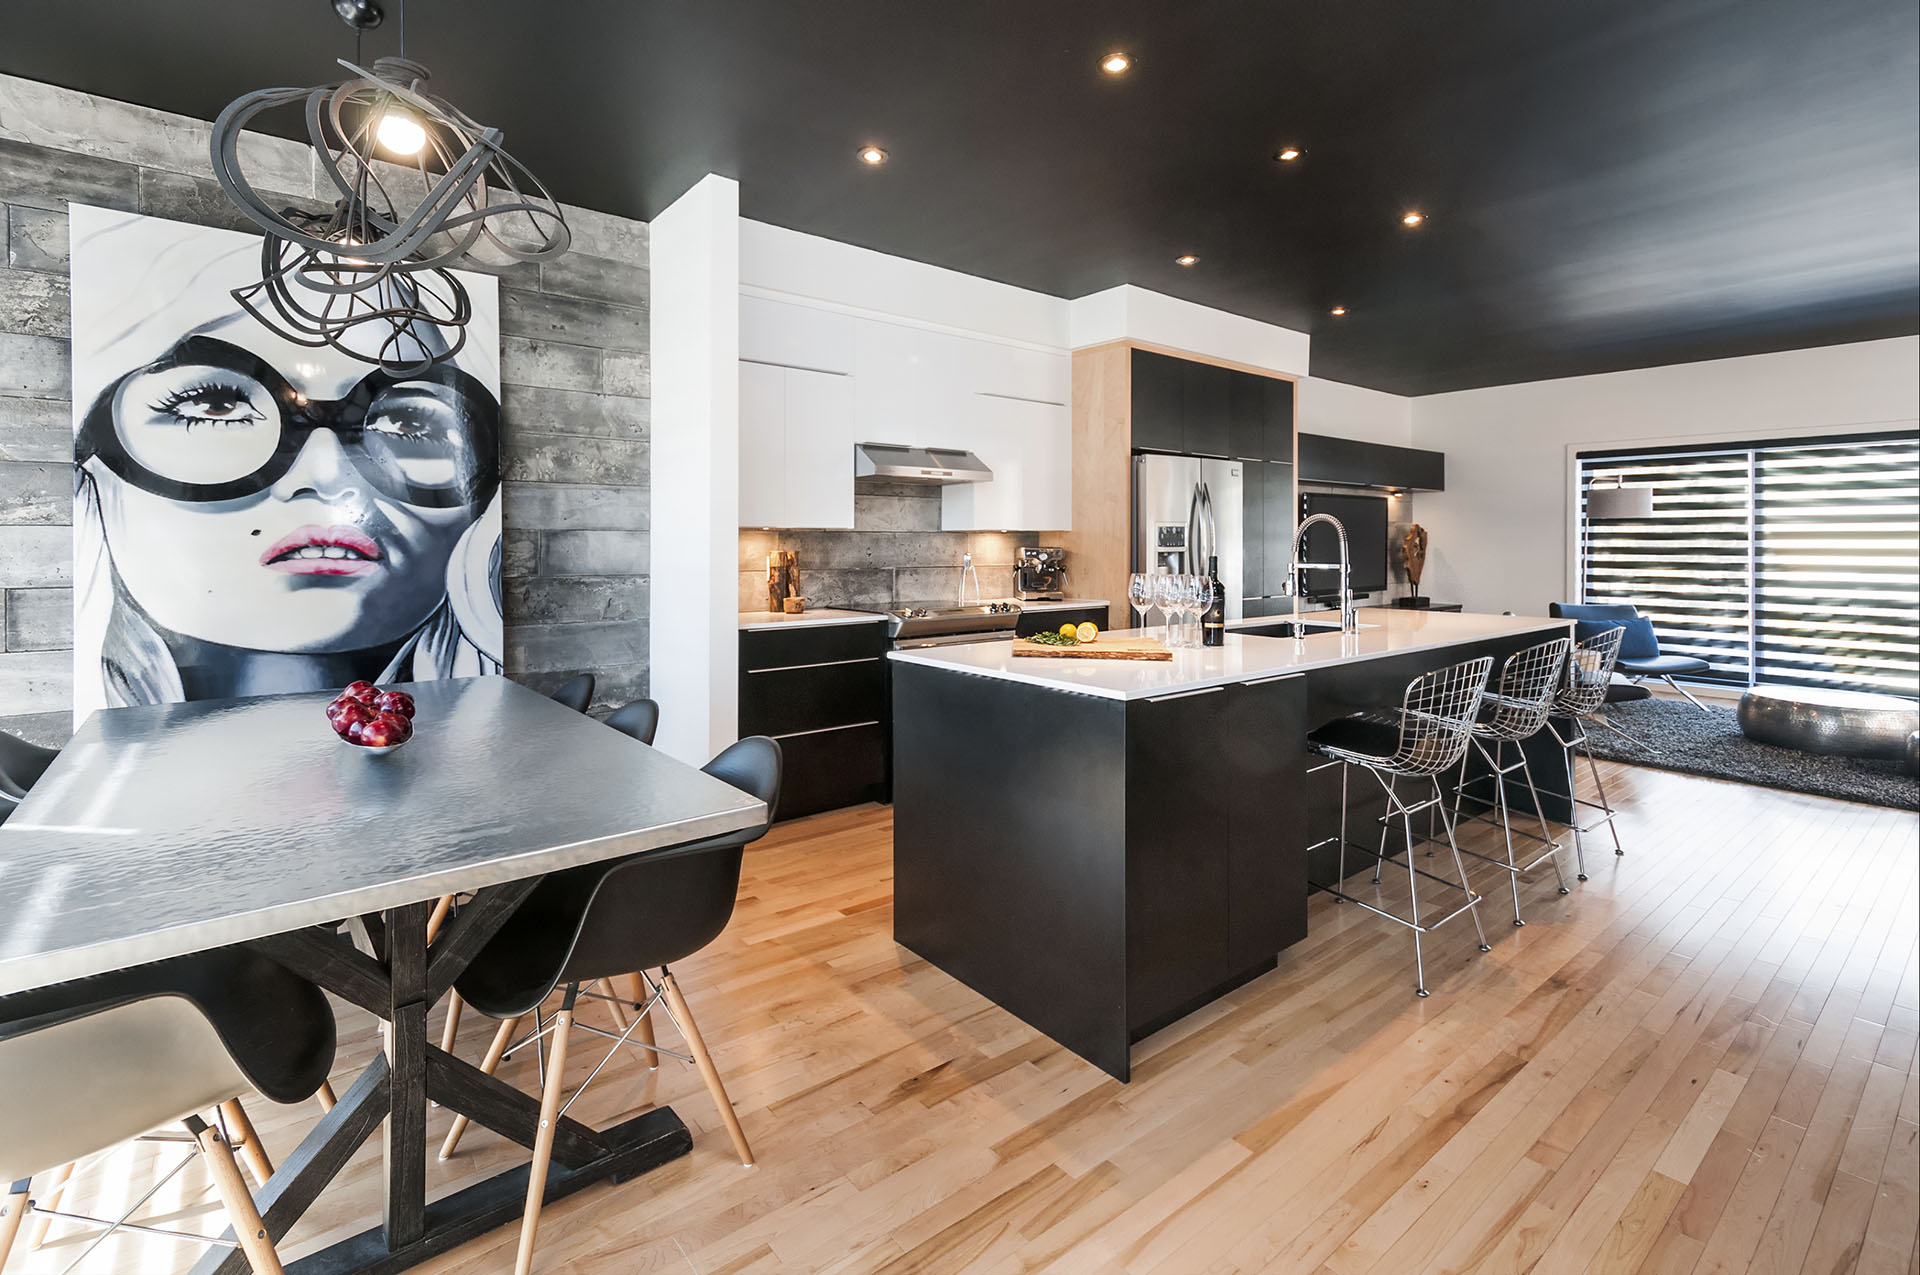 Photographe immobilier Tournai